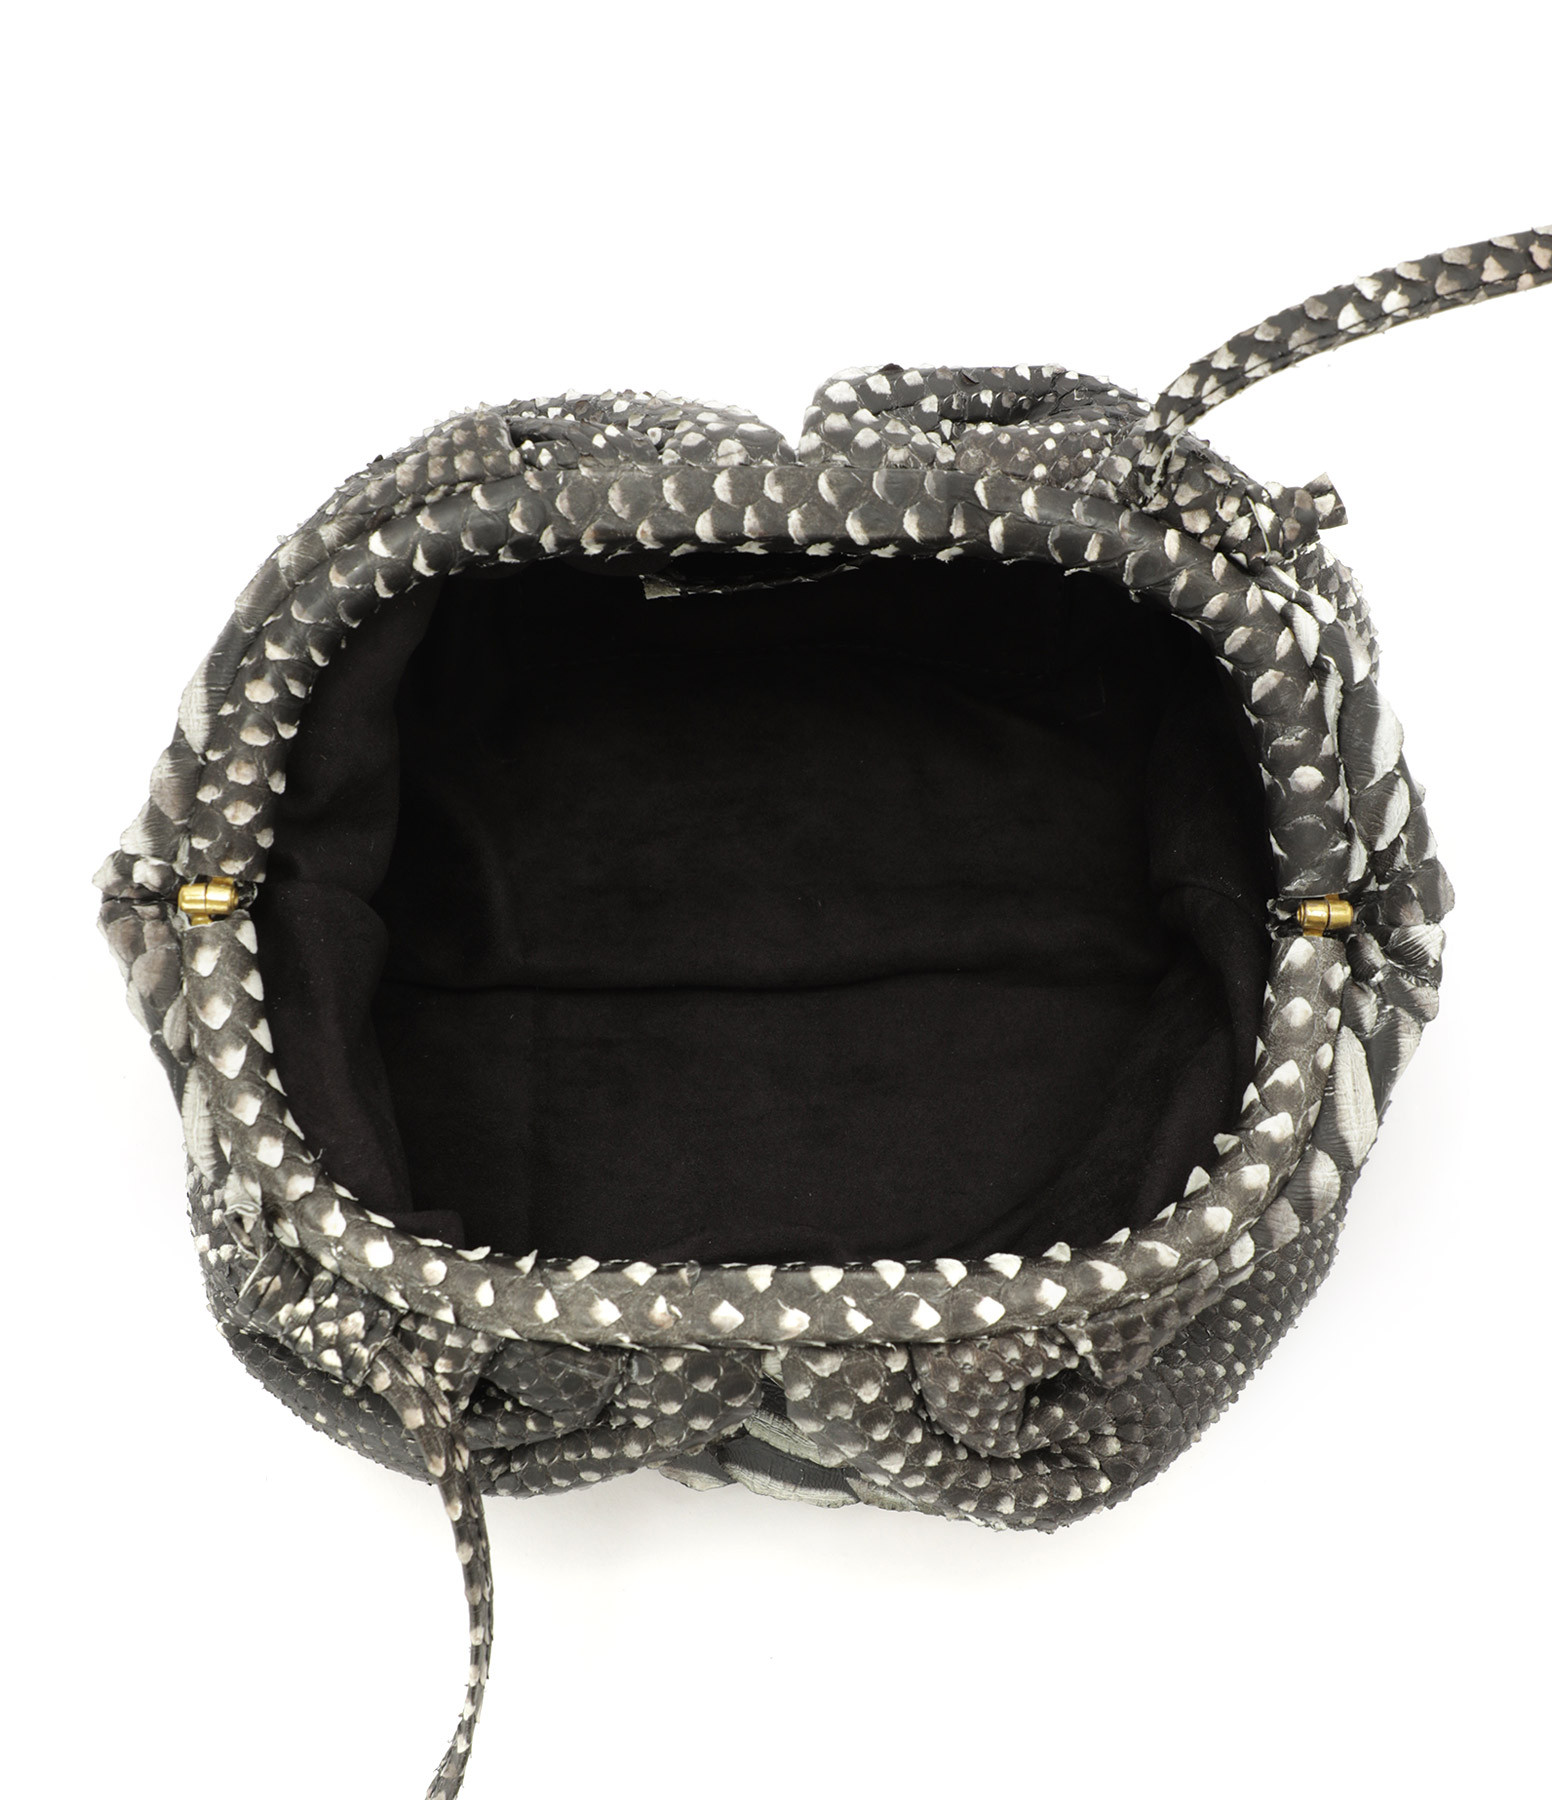 SISTA - Sac Baby Cuir Souple Python Noir Blanc